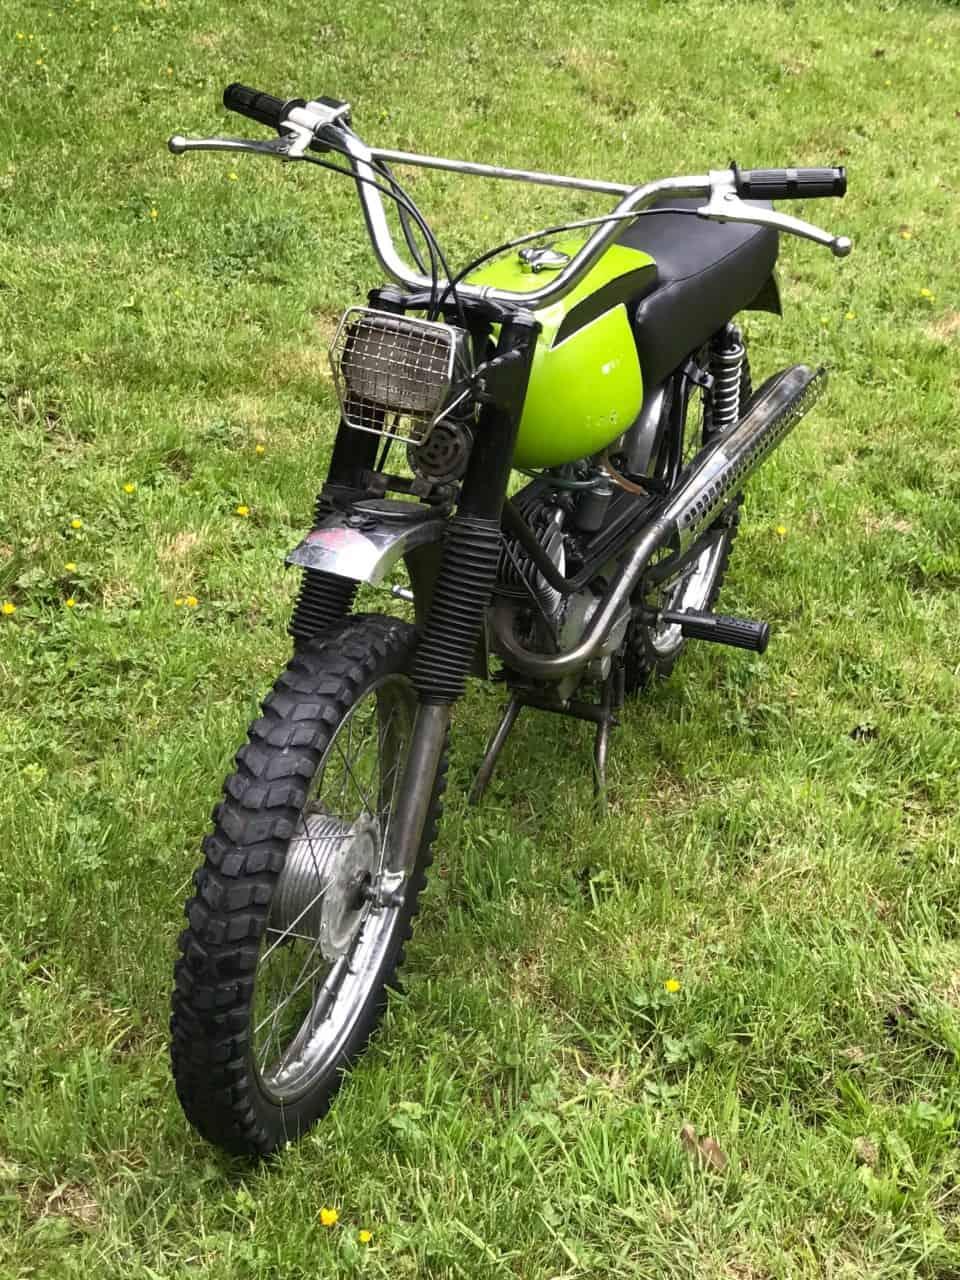 MOTO GUZZI DINGO CROSS 50cc 1972